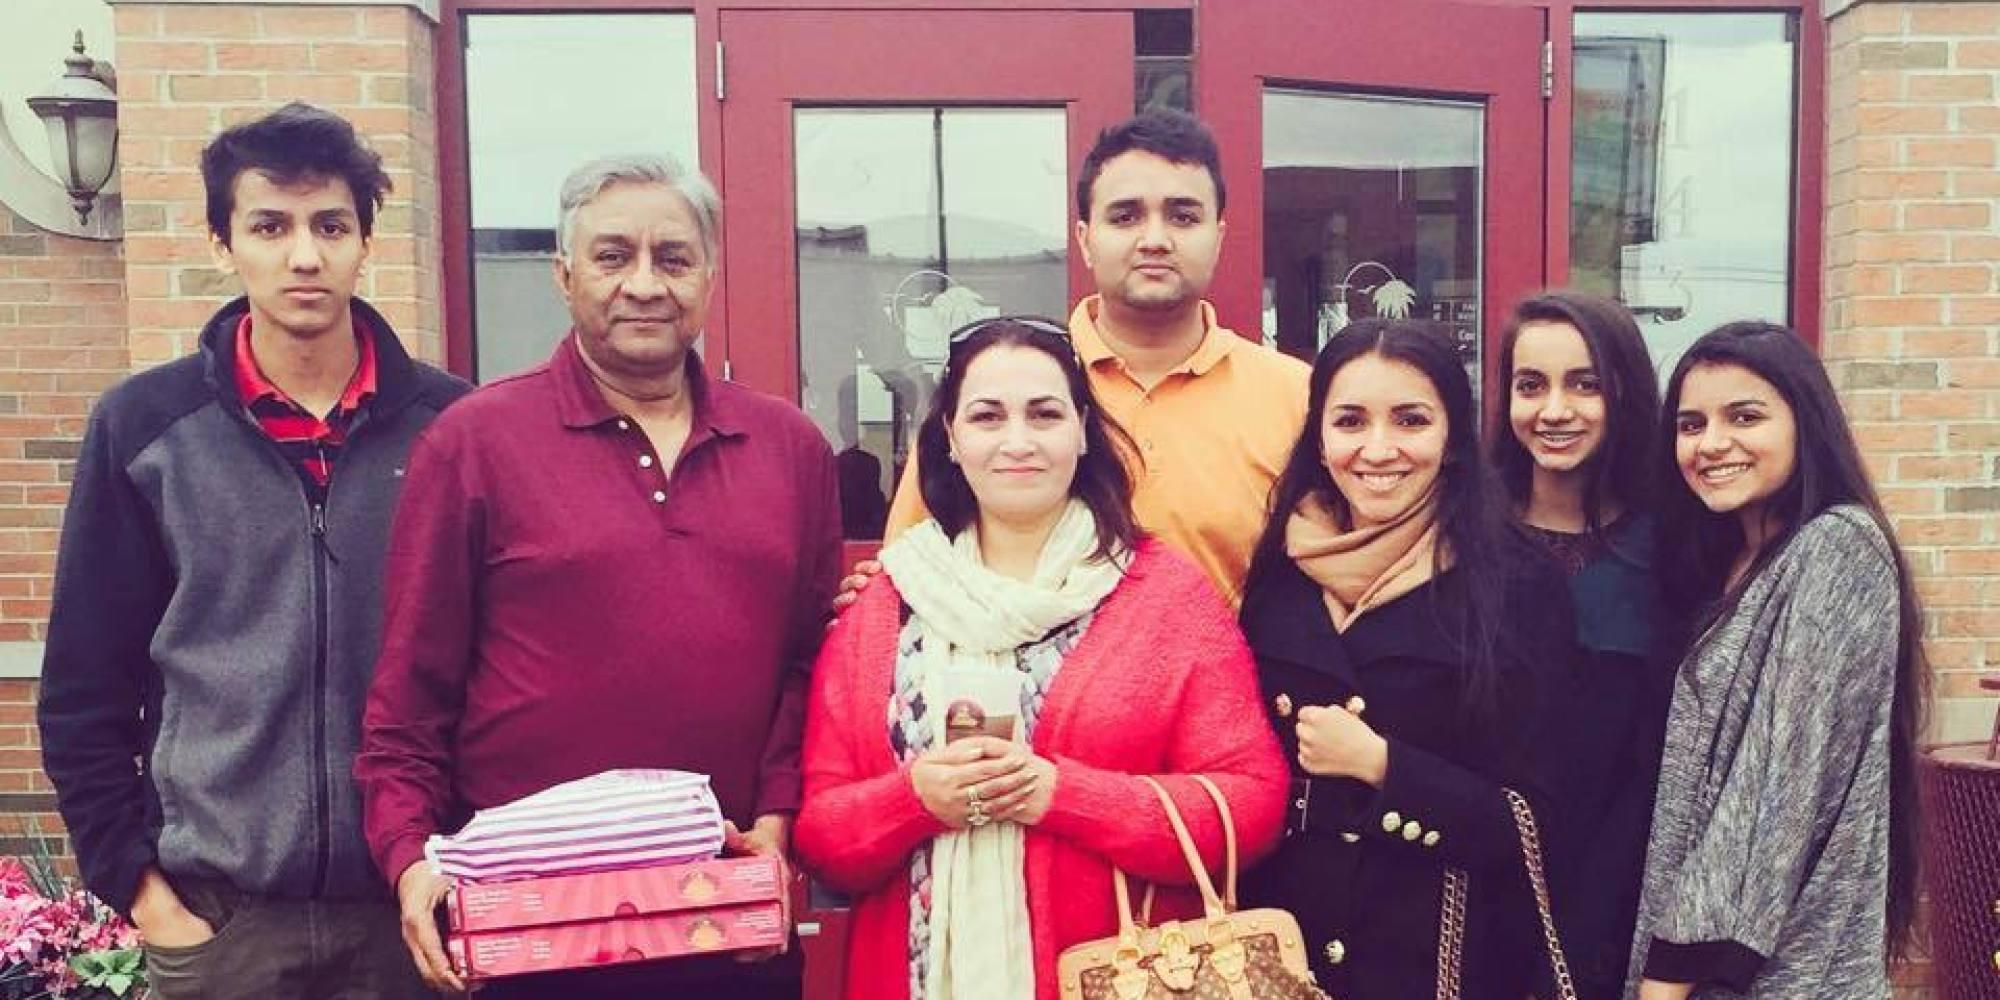 Meet the Modern Muslim-American Family | Parenting